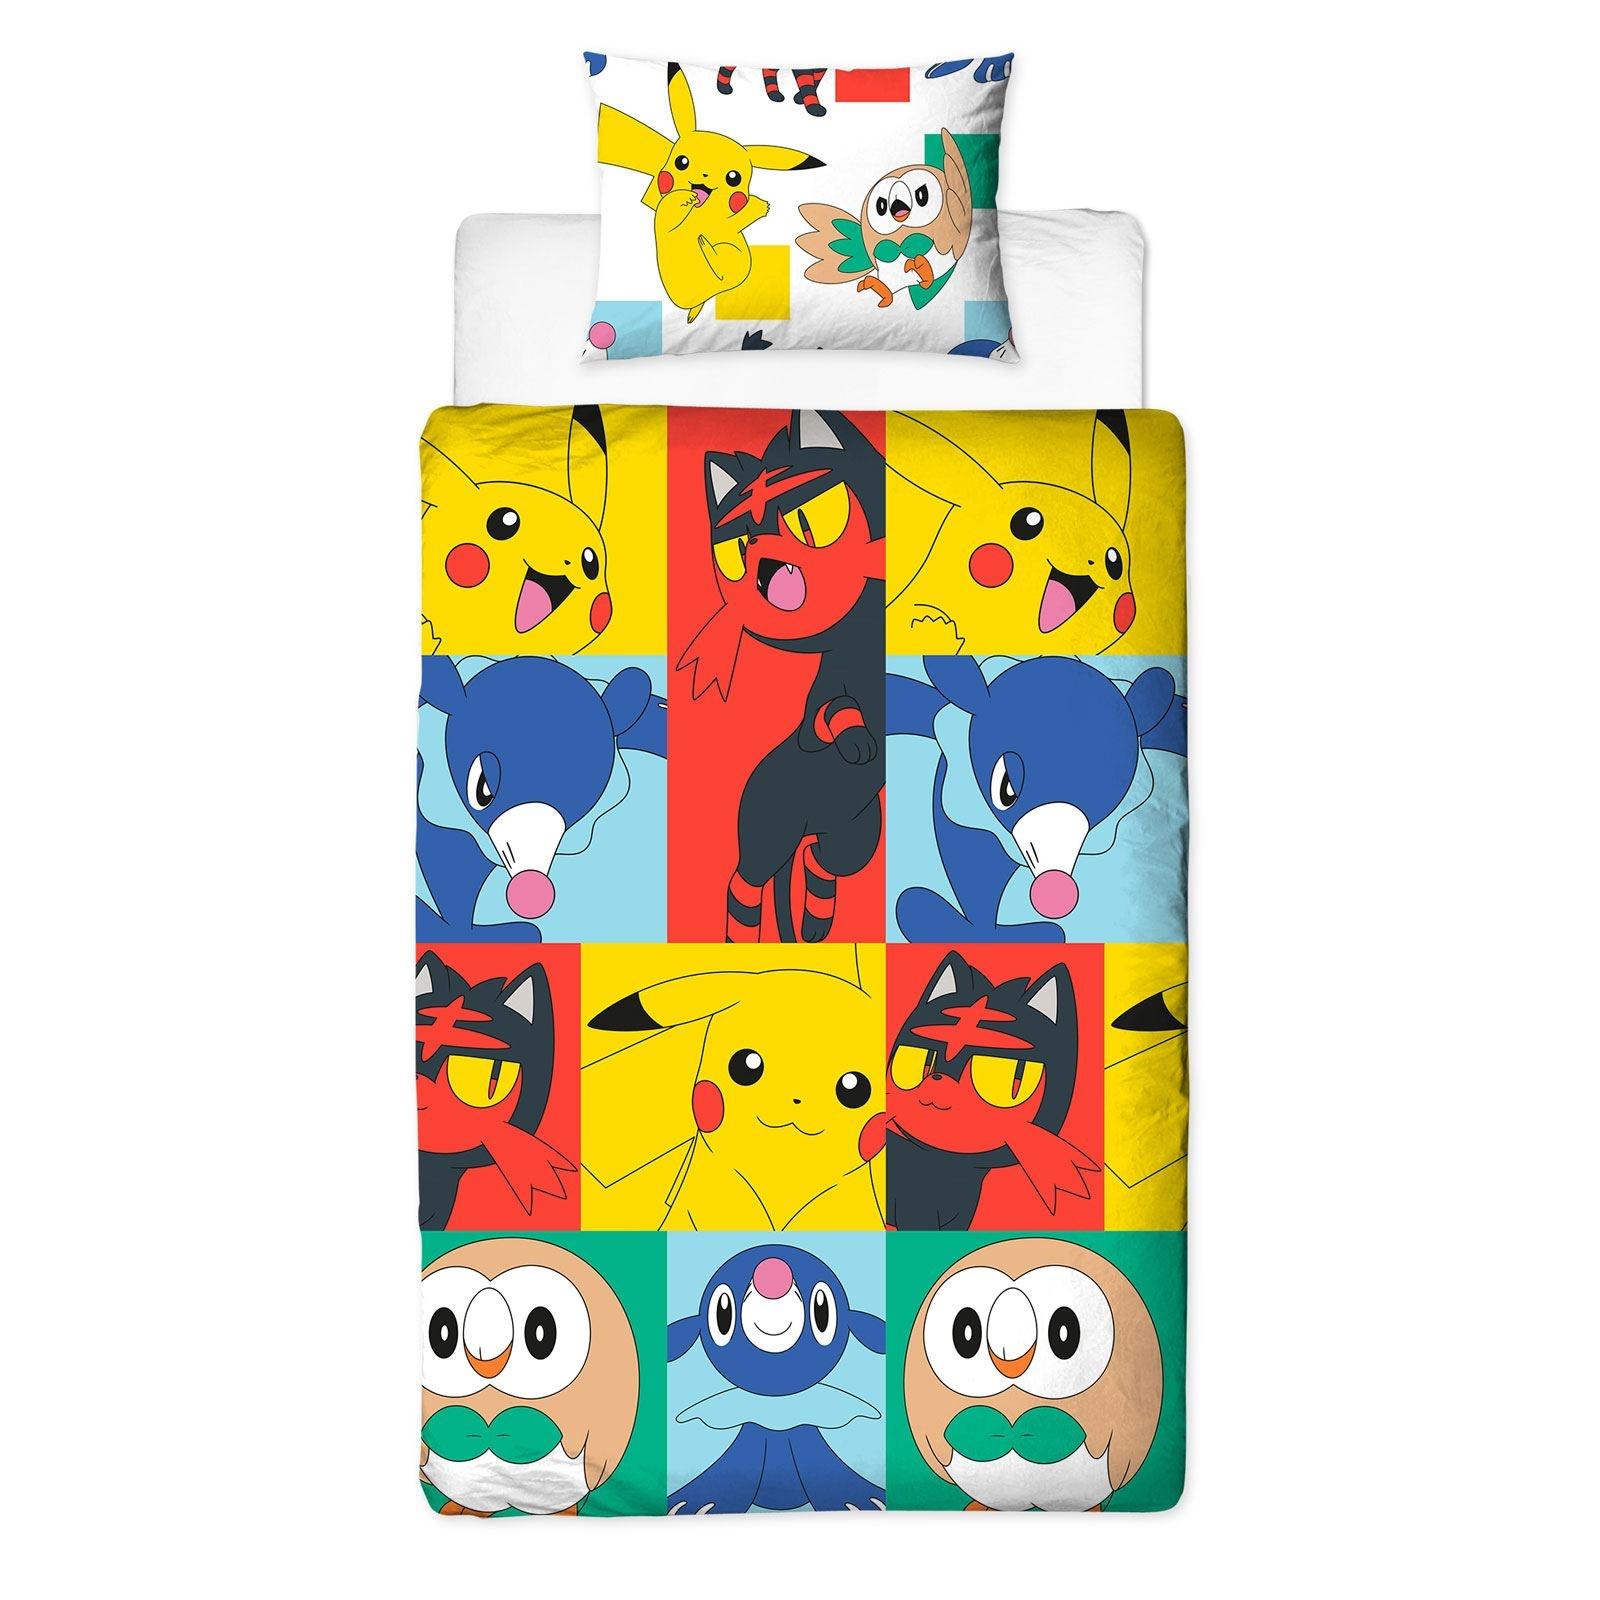 Pokémon Pokémon Dekbedovertrek Newbies